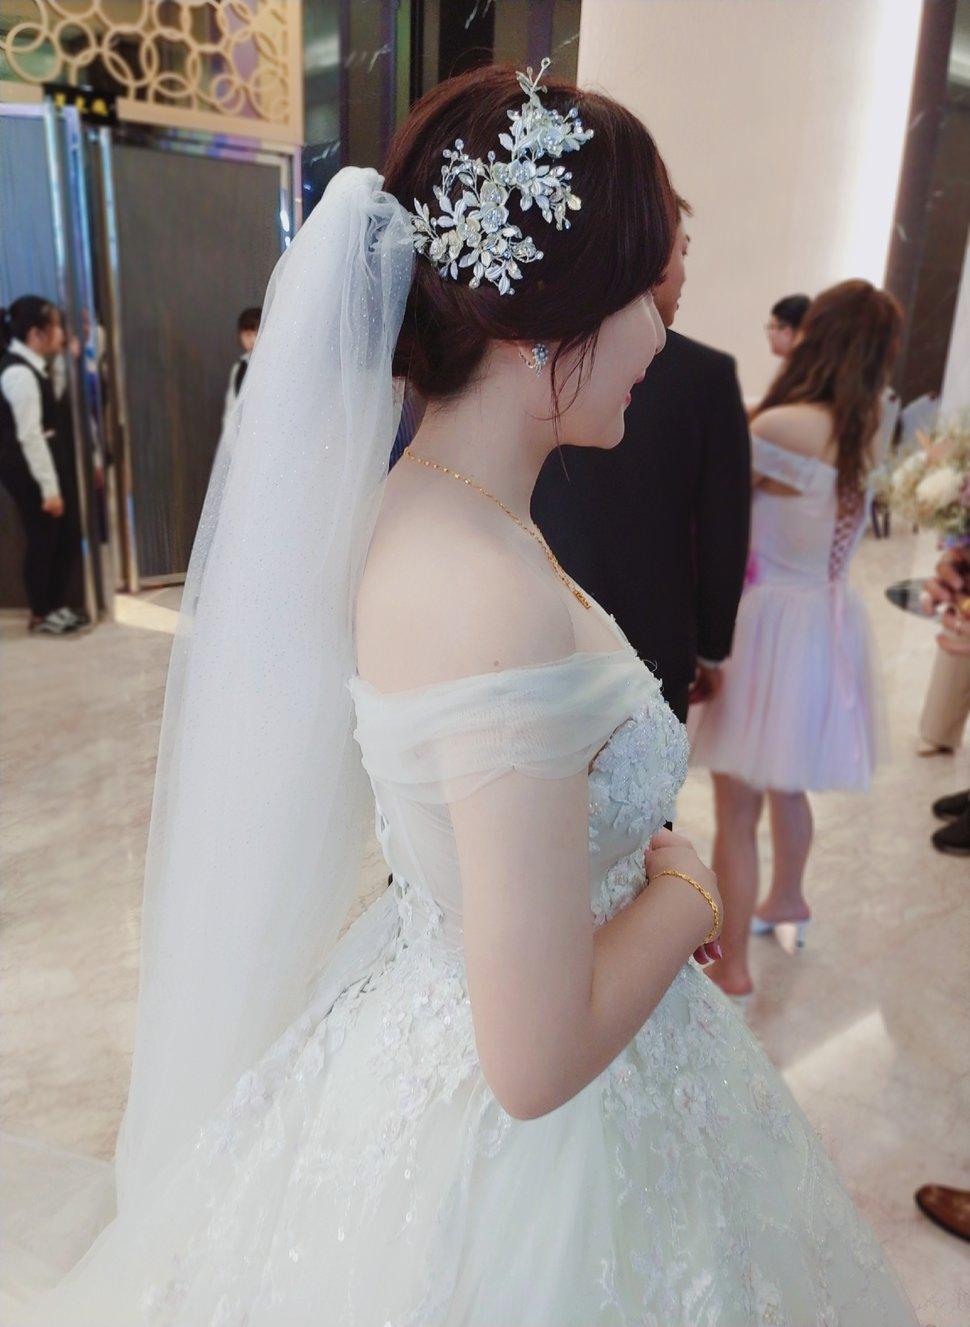 0C50A7B7-3586-4F8F-8E67-A03F0FB80294 - Nanami 張慈慈《結婚吧》